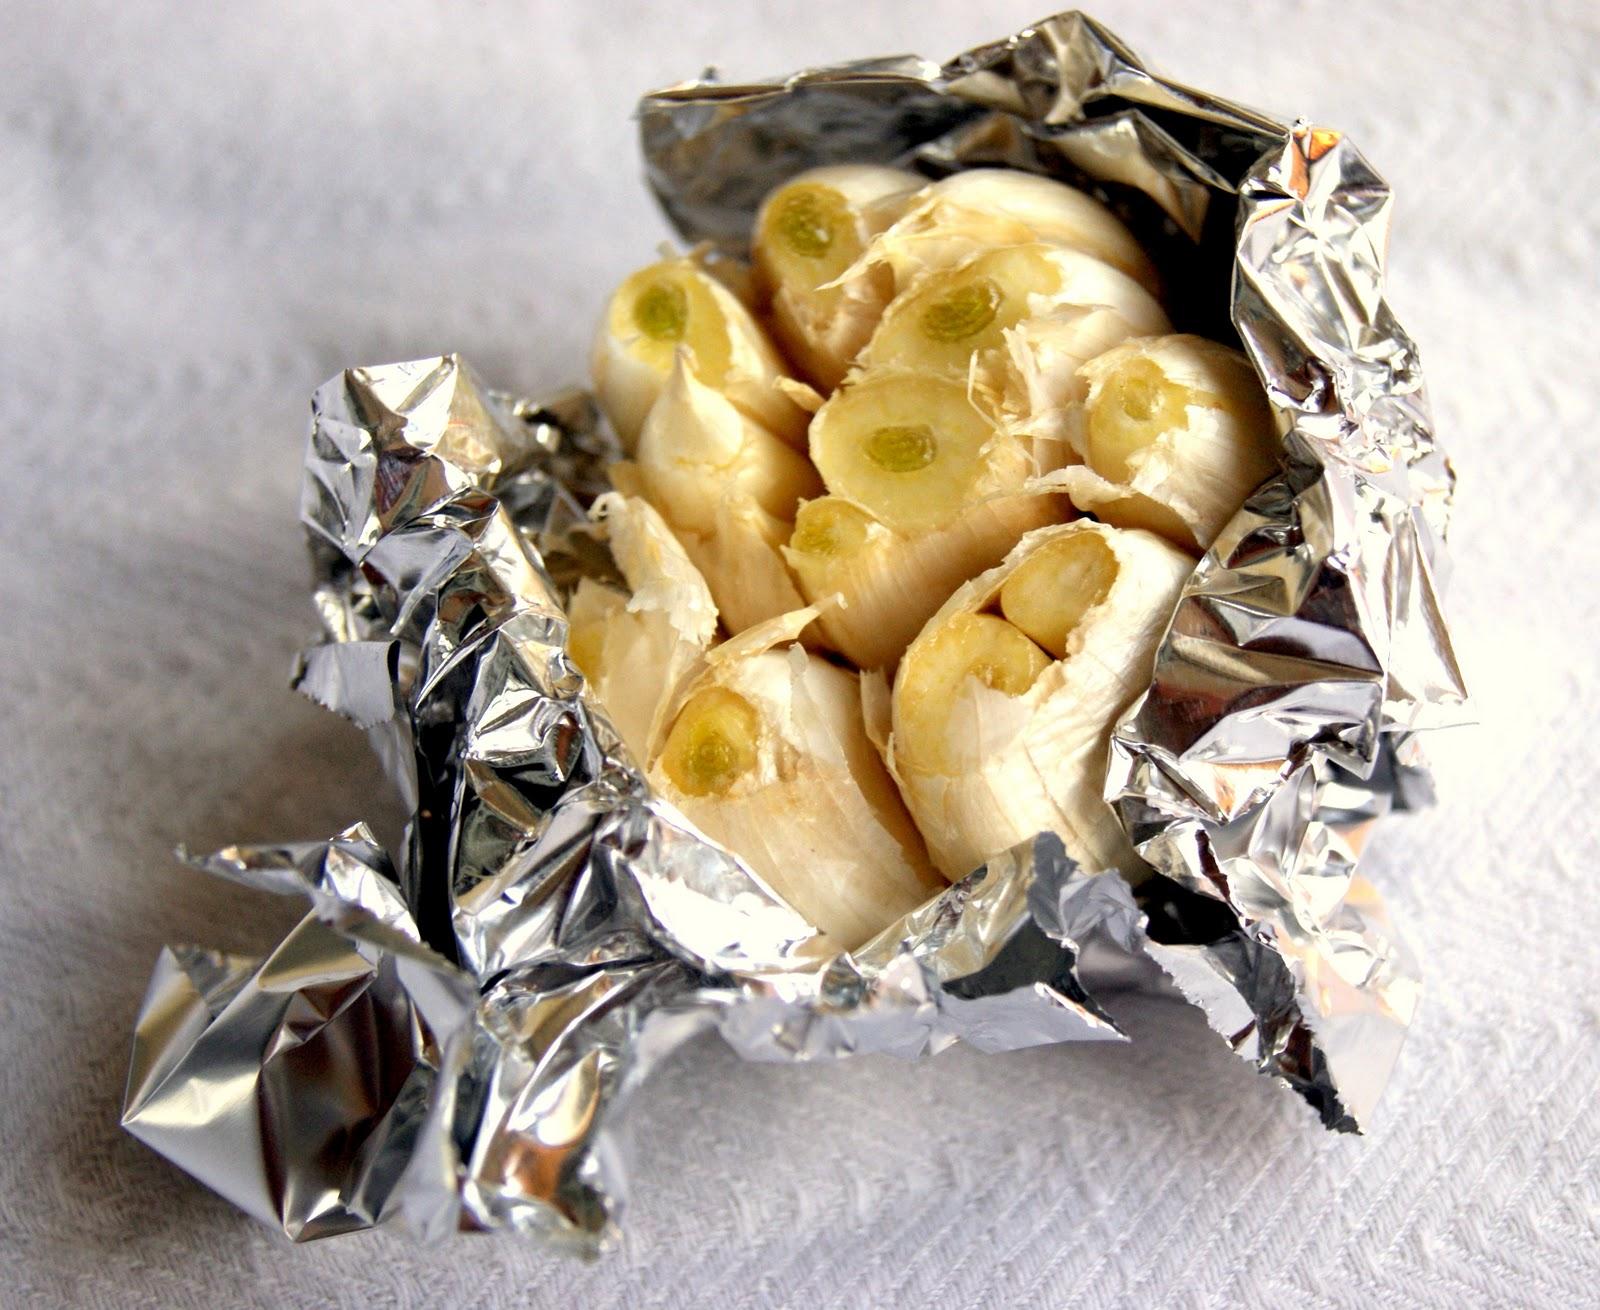 roasted garlic.jpg